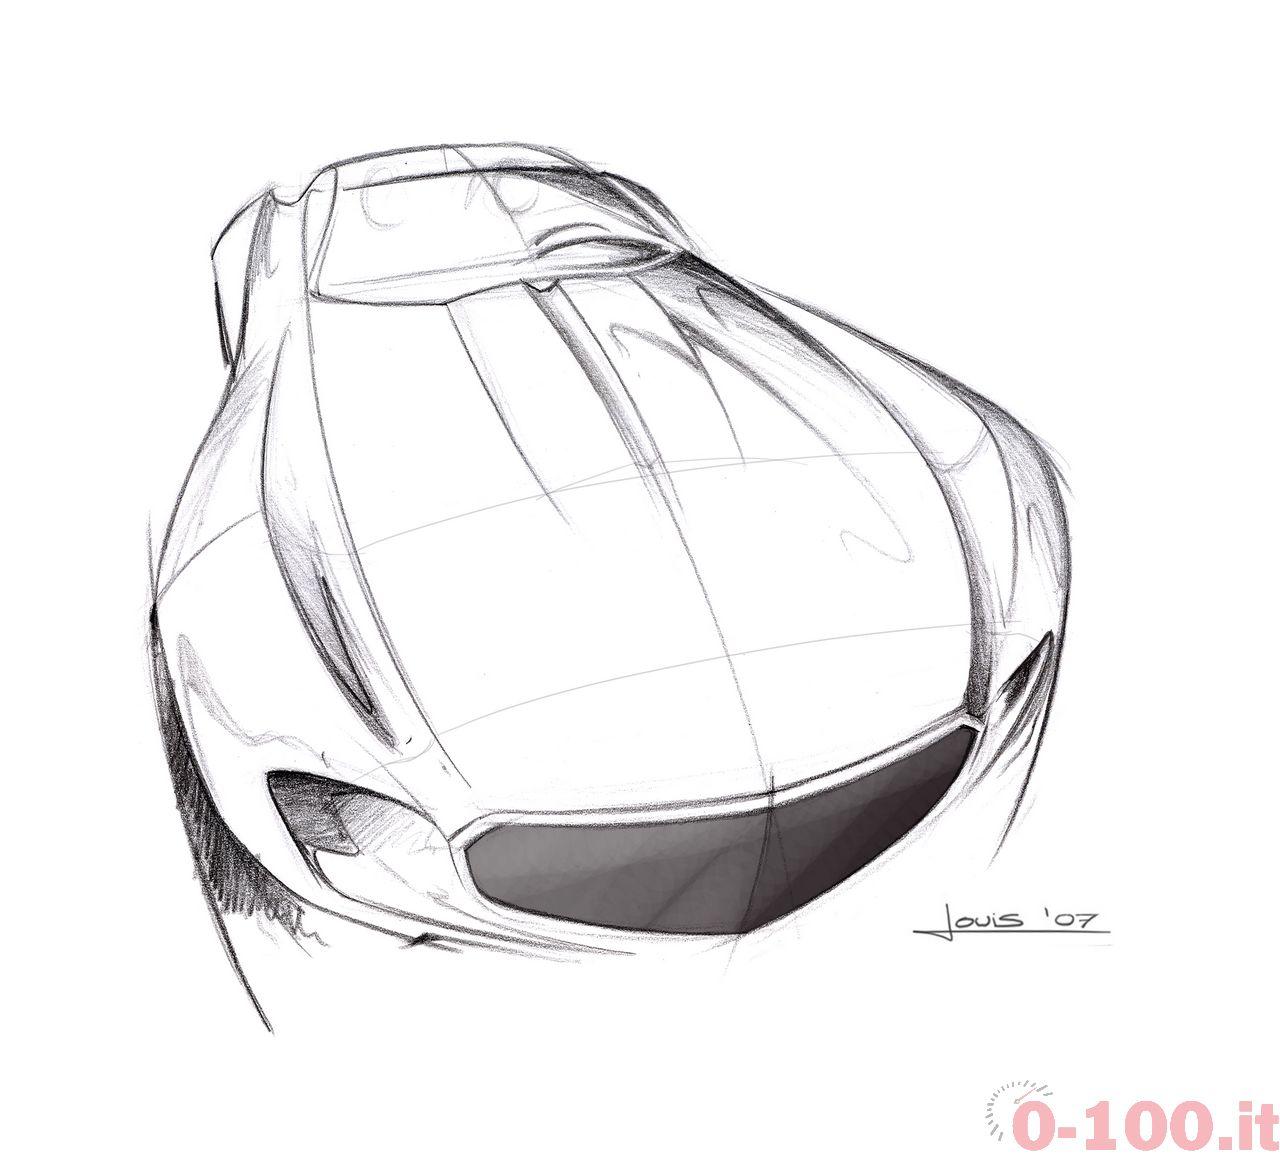 maserati-a8-gcs-touring-superleggera-carrozzeria-0-100_22